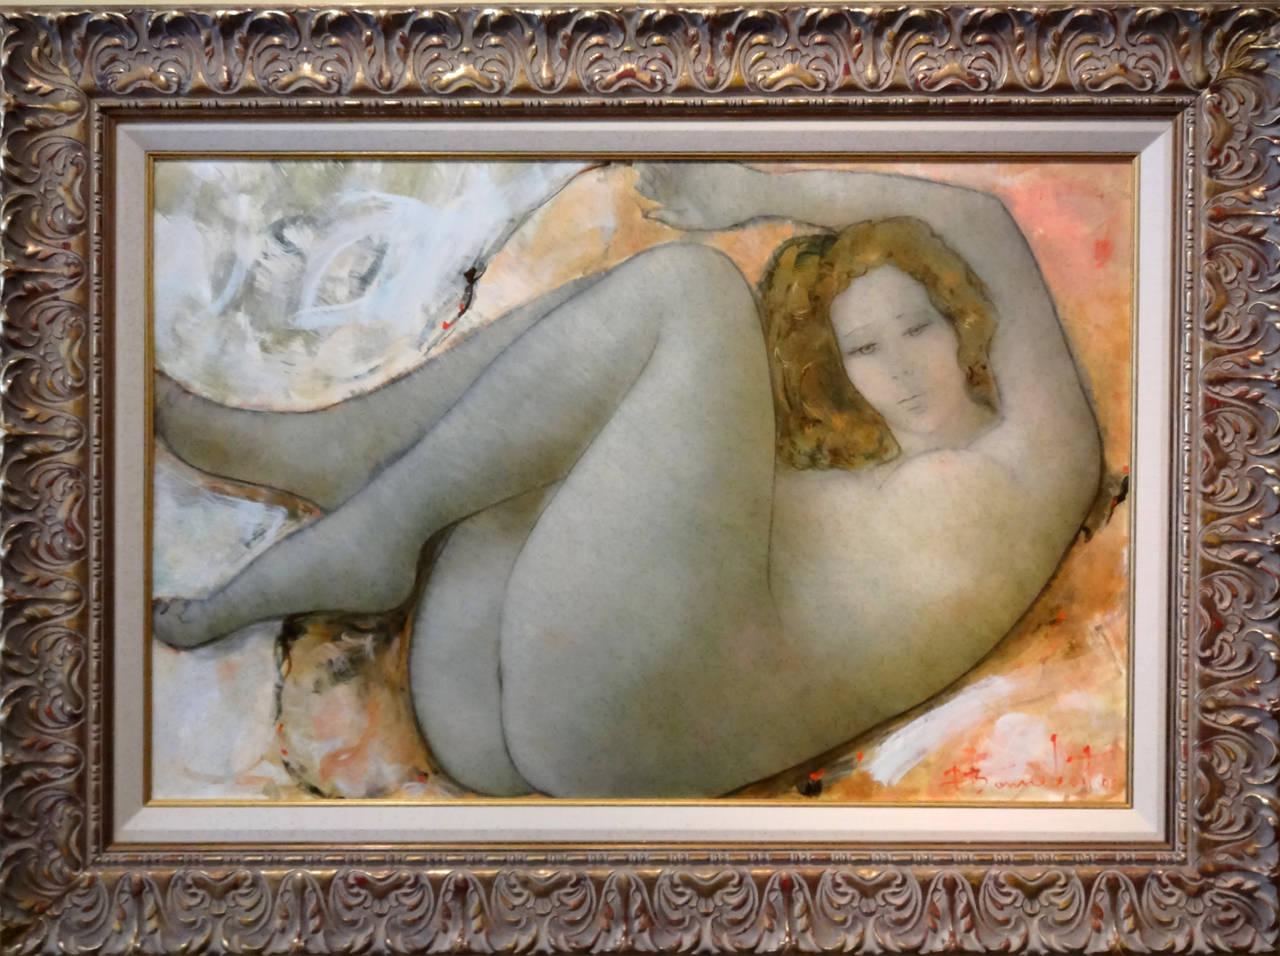 Felicity - Painting by Alain Bonnefoit